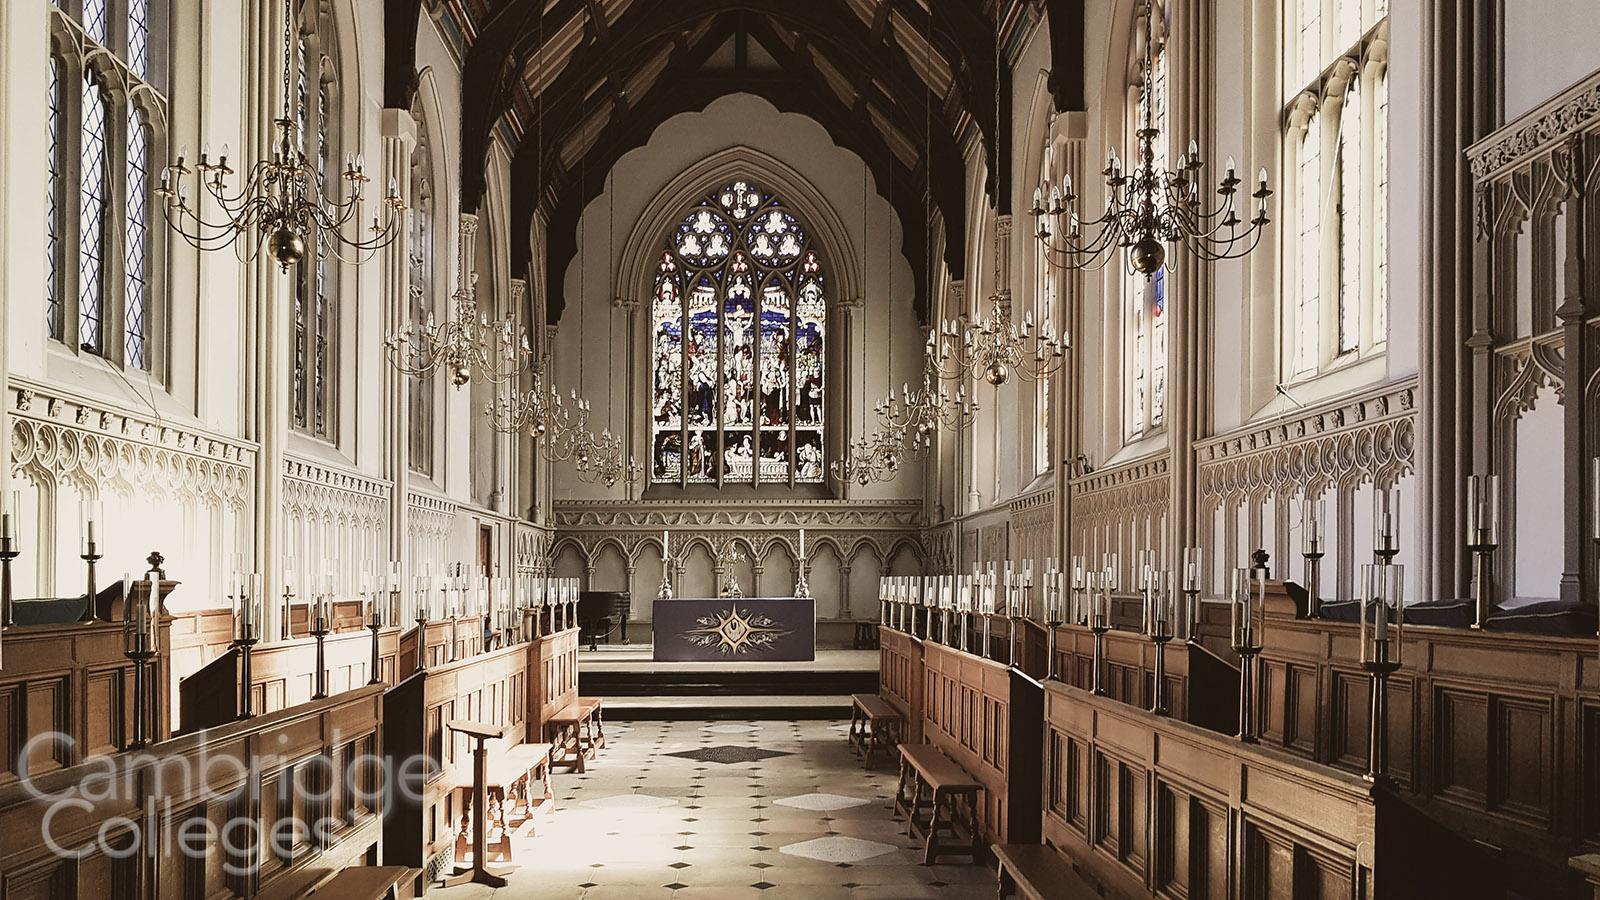 Inside the chapel of Corpus Christi college, Cambridge